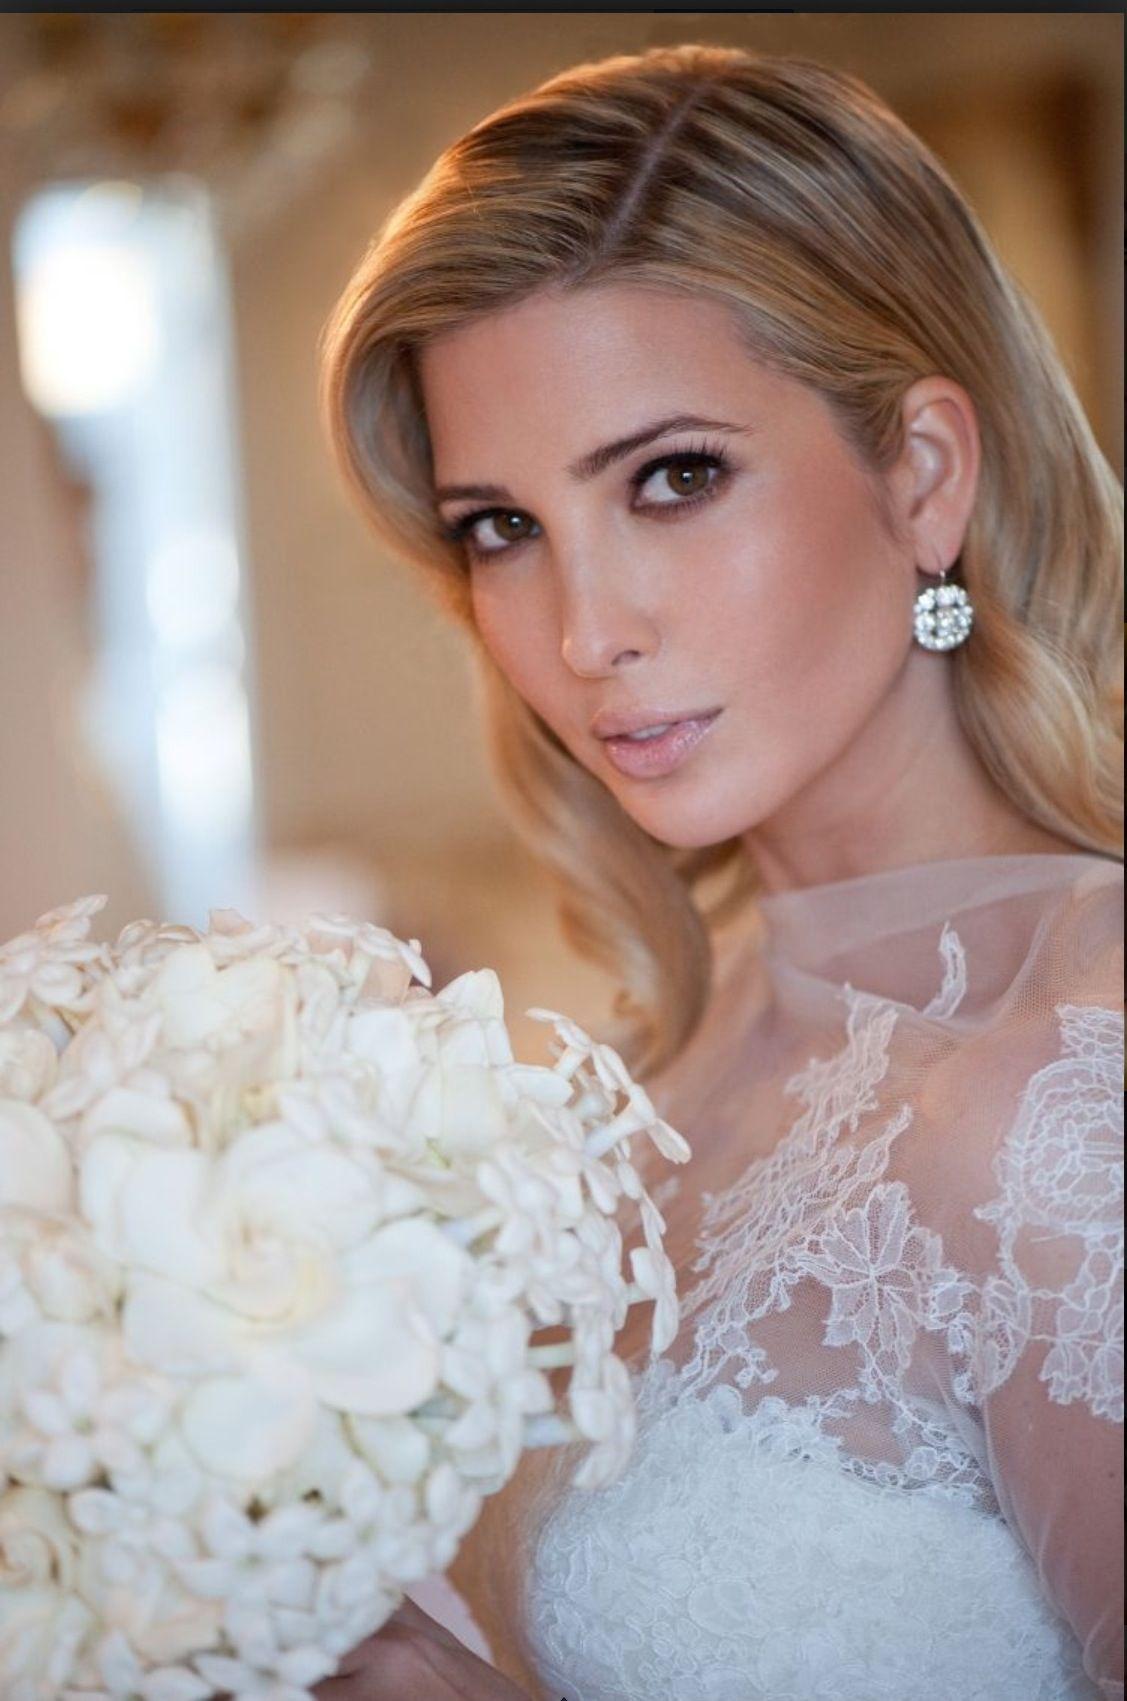 Make Up Ivanka Trump Wedding Trump Wedding Celebrity Weddings